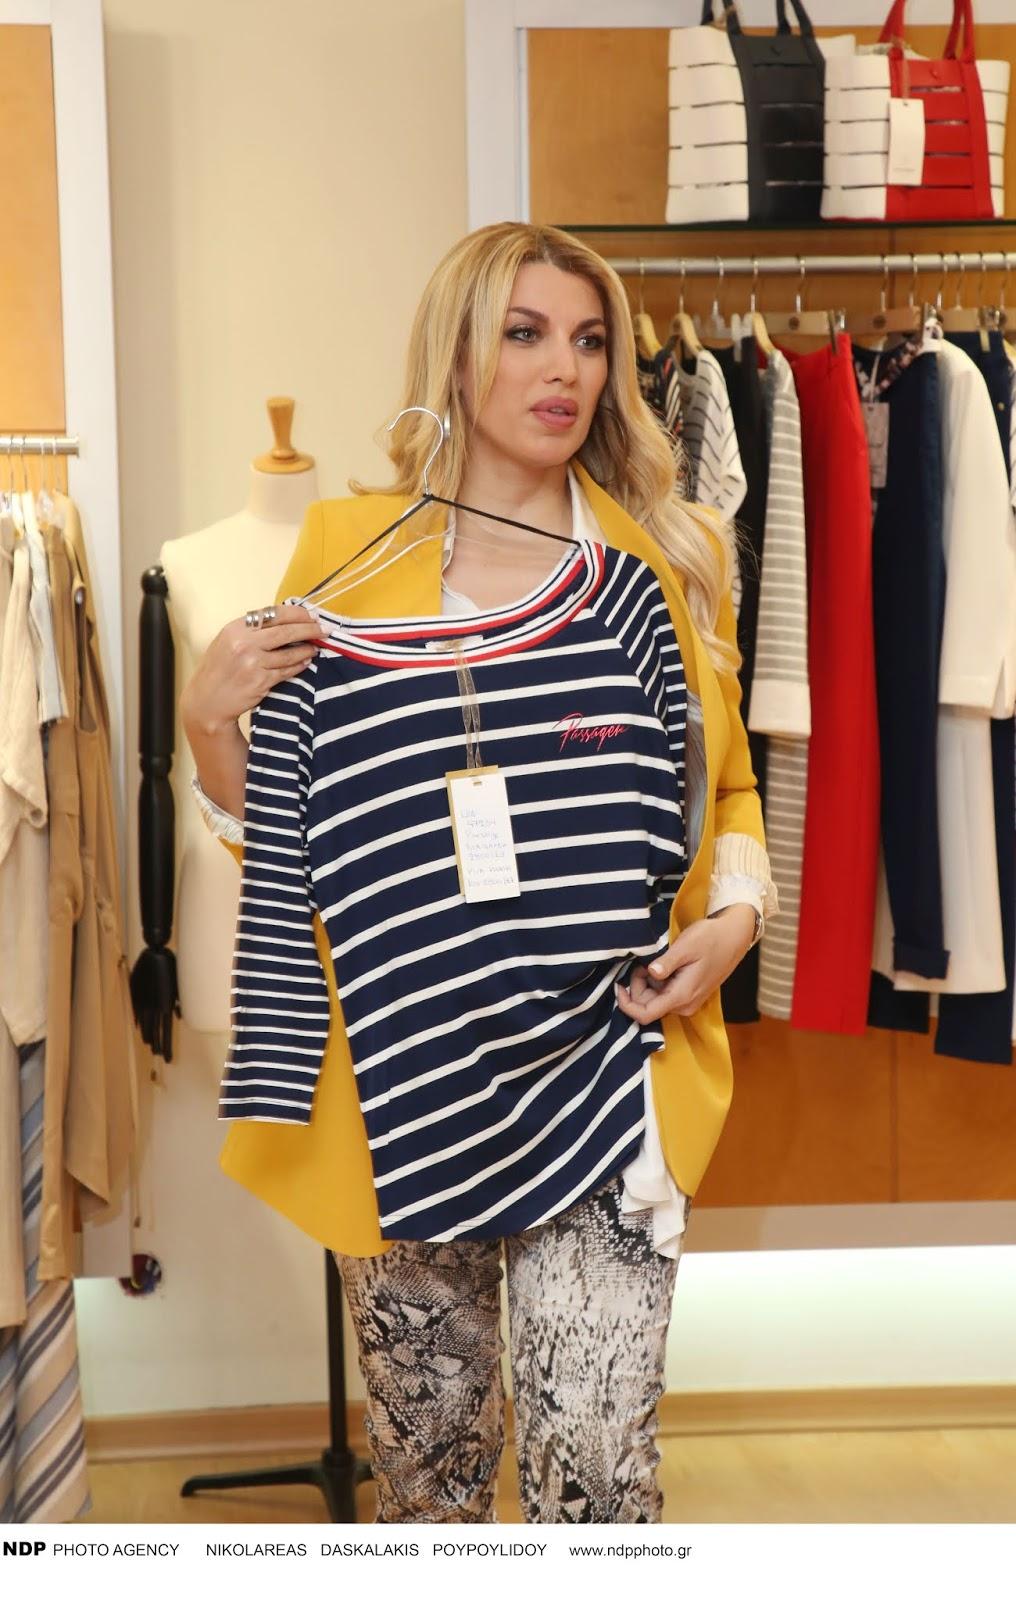 "f2b54214c890 Τα ρούχα ""Passager"" μπορεί κανείς να αναζητήσει σε επιλεγμένα καταστήματα  σε όλη την Ελλάδα."